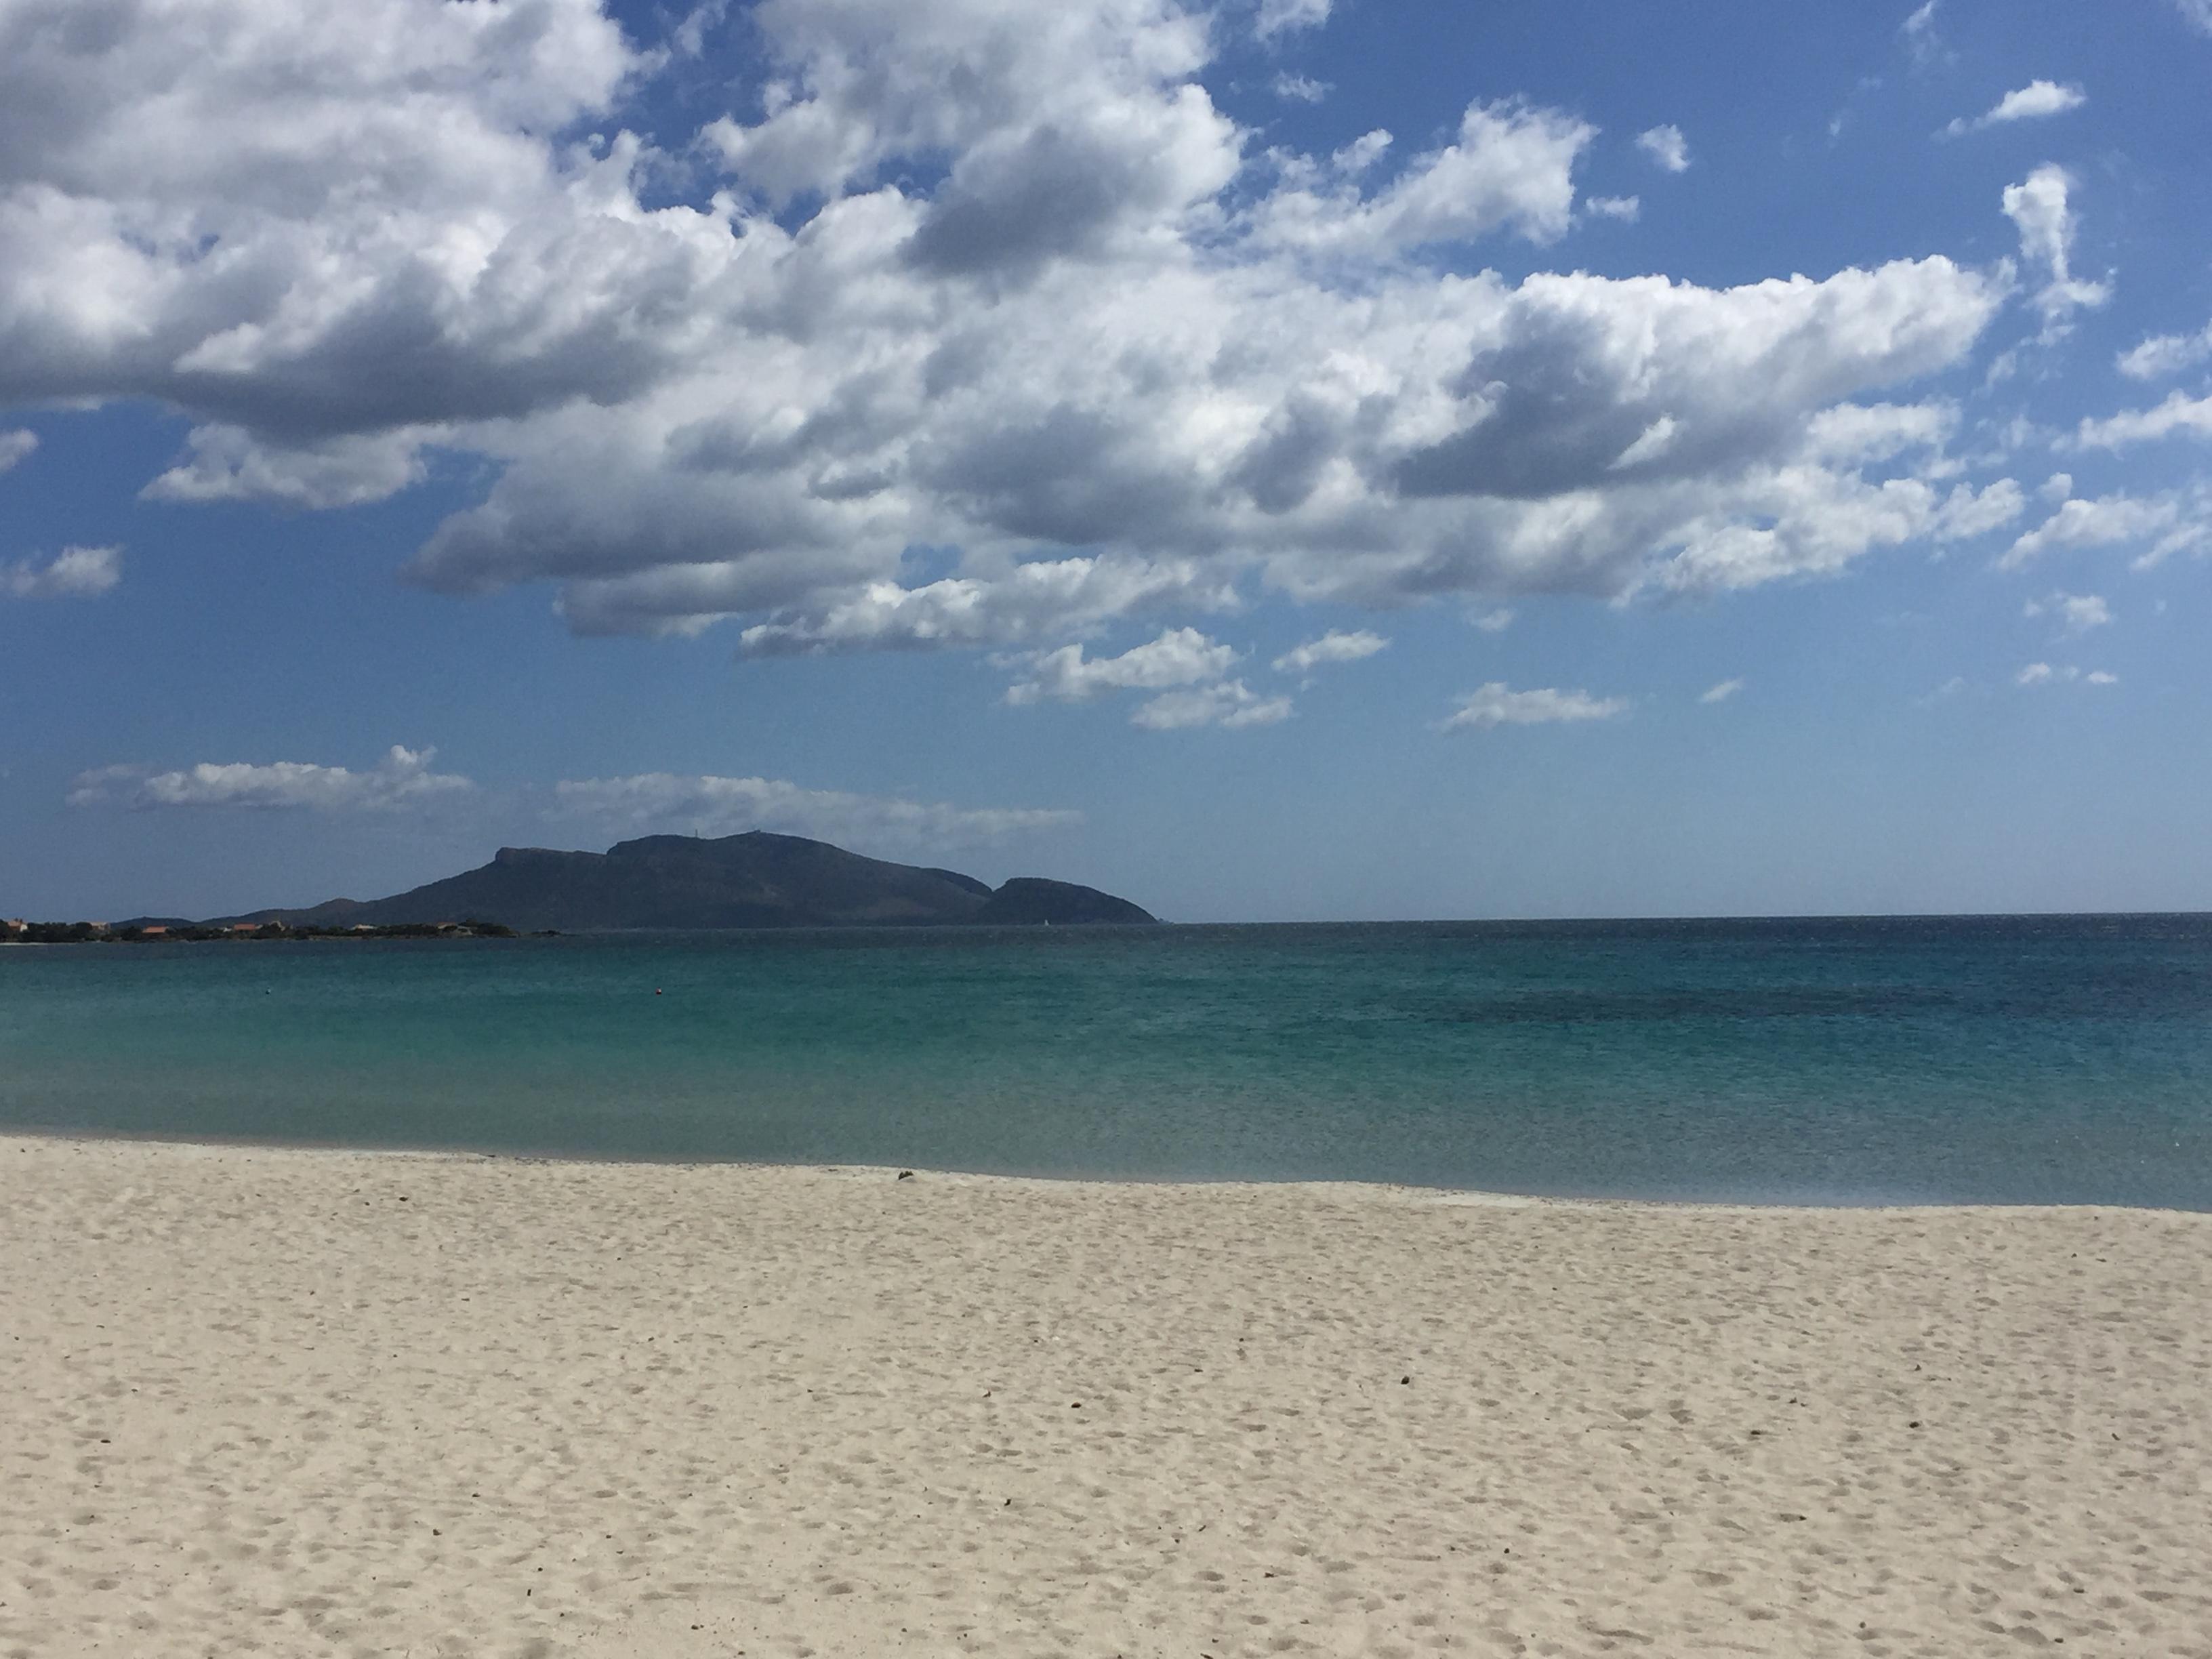 Pittulongu beach in Olbia, Sardinia | BrowsingItaly.com